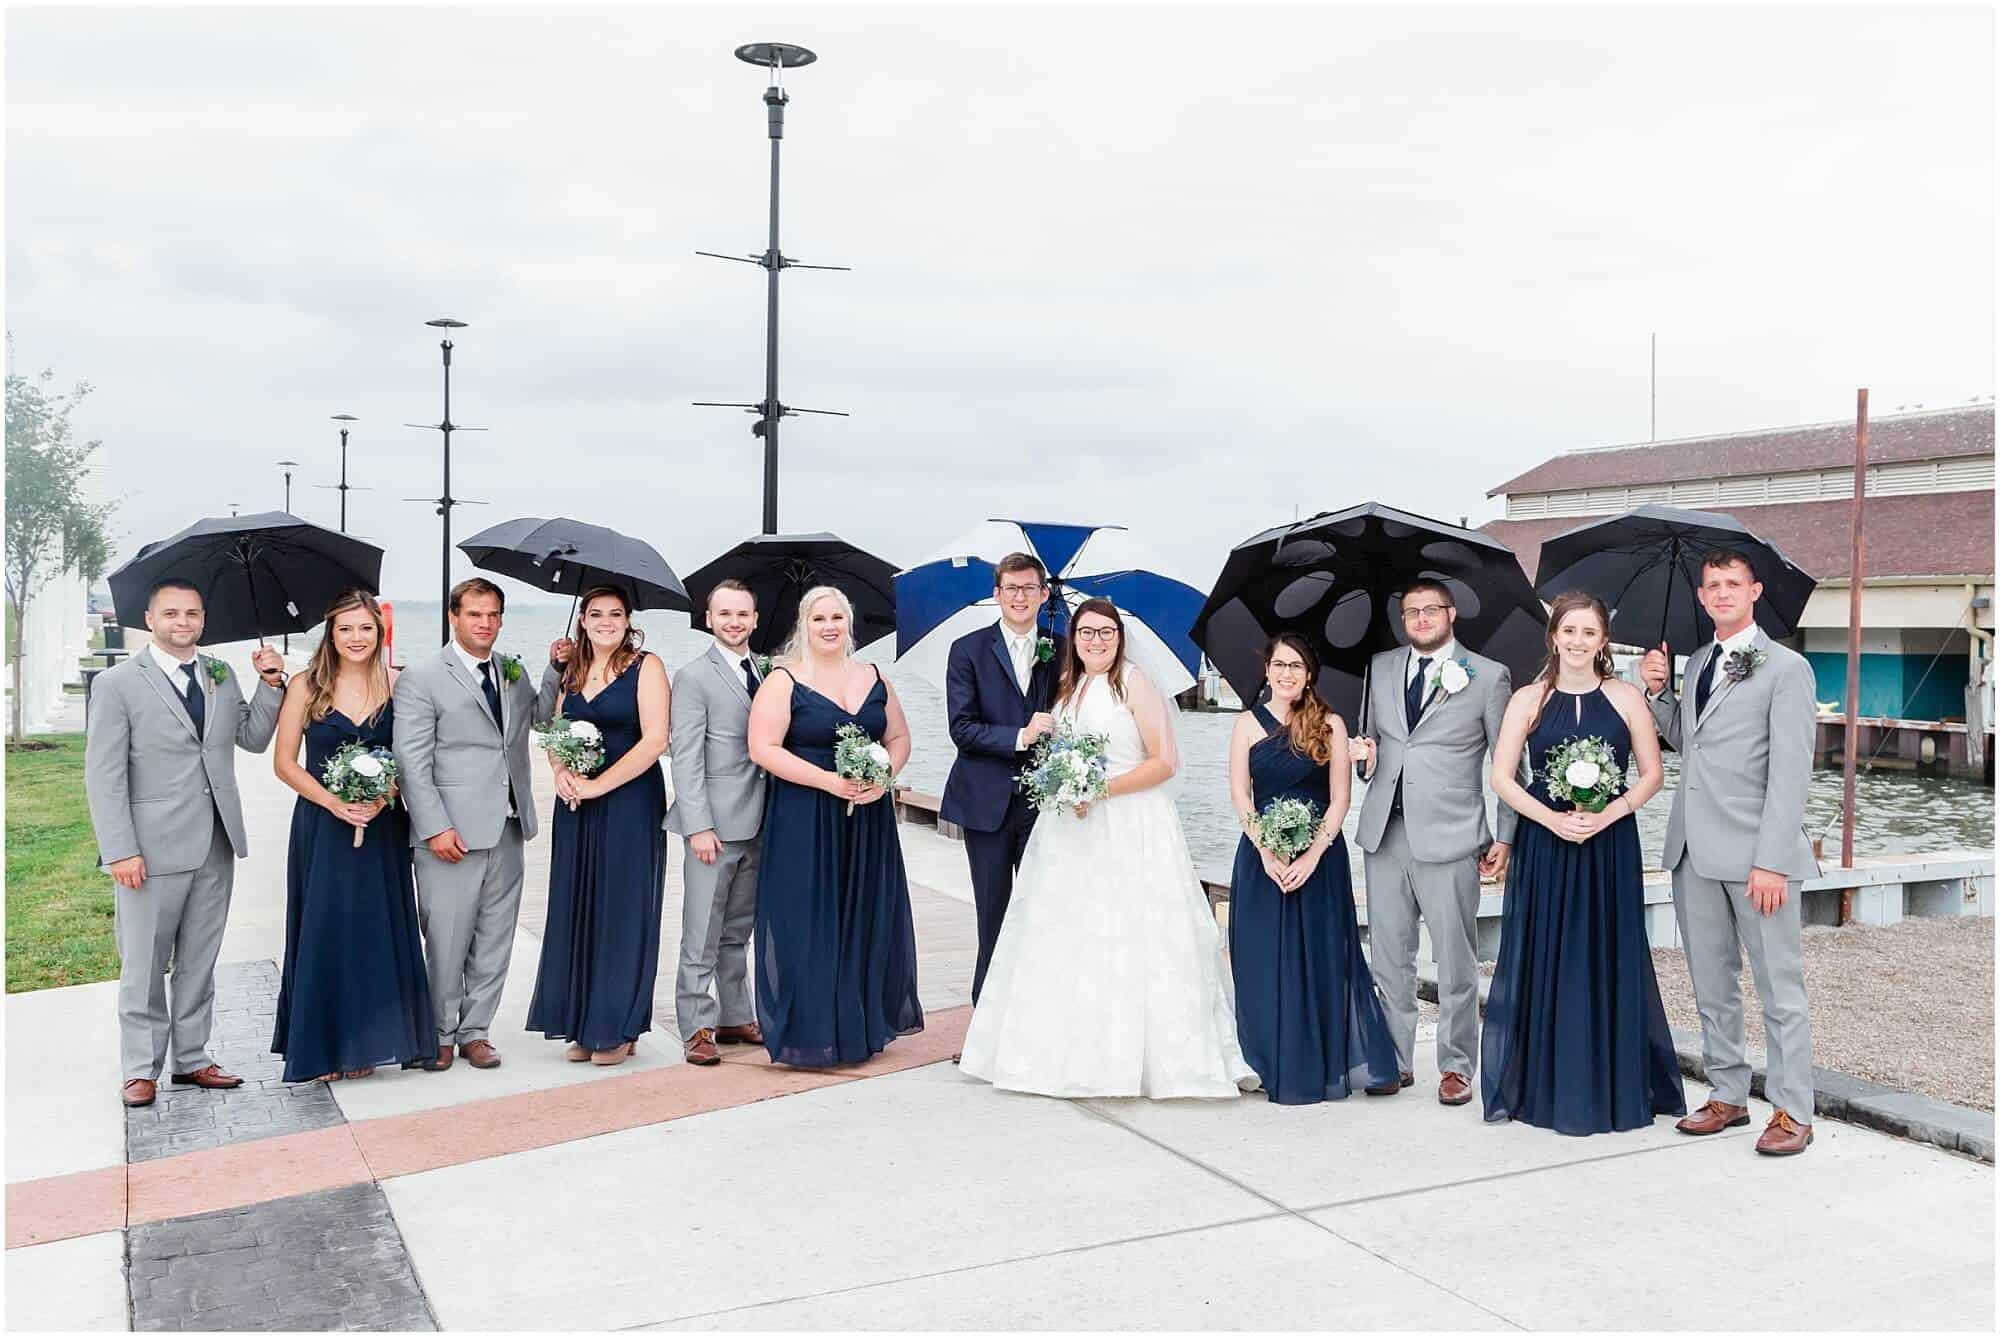 rainy wedding lakeside on lake erie by tiffany murray